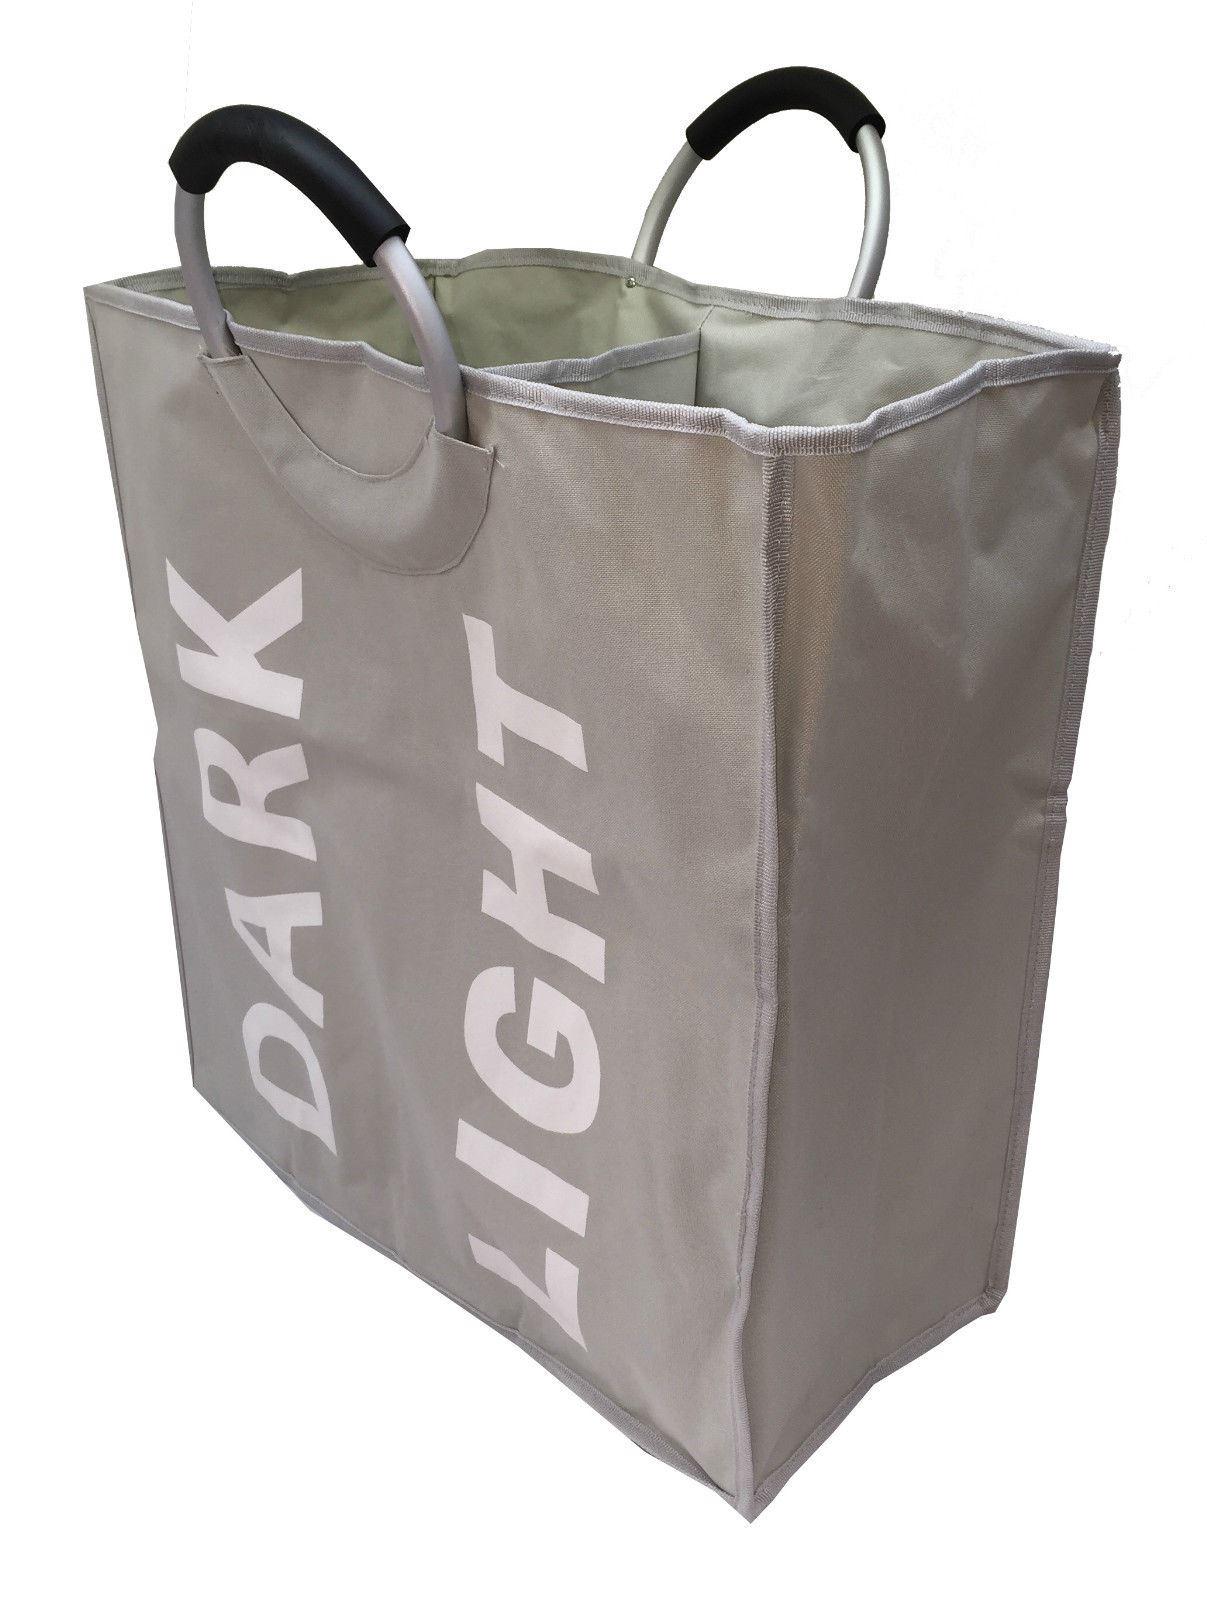 New Collapsible Folding Laundry Bag Bin Hamper Storage